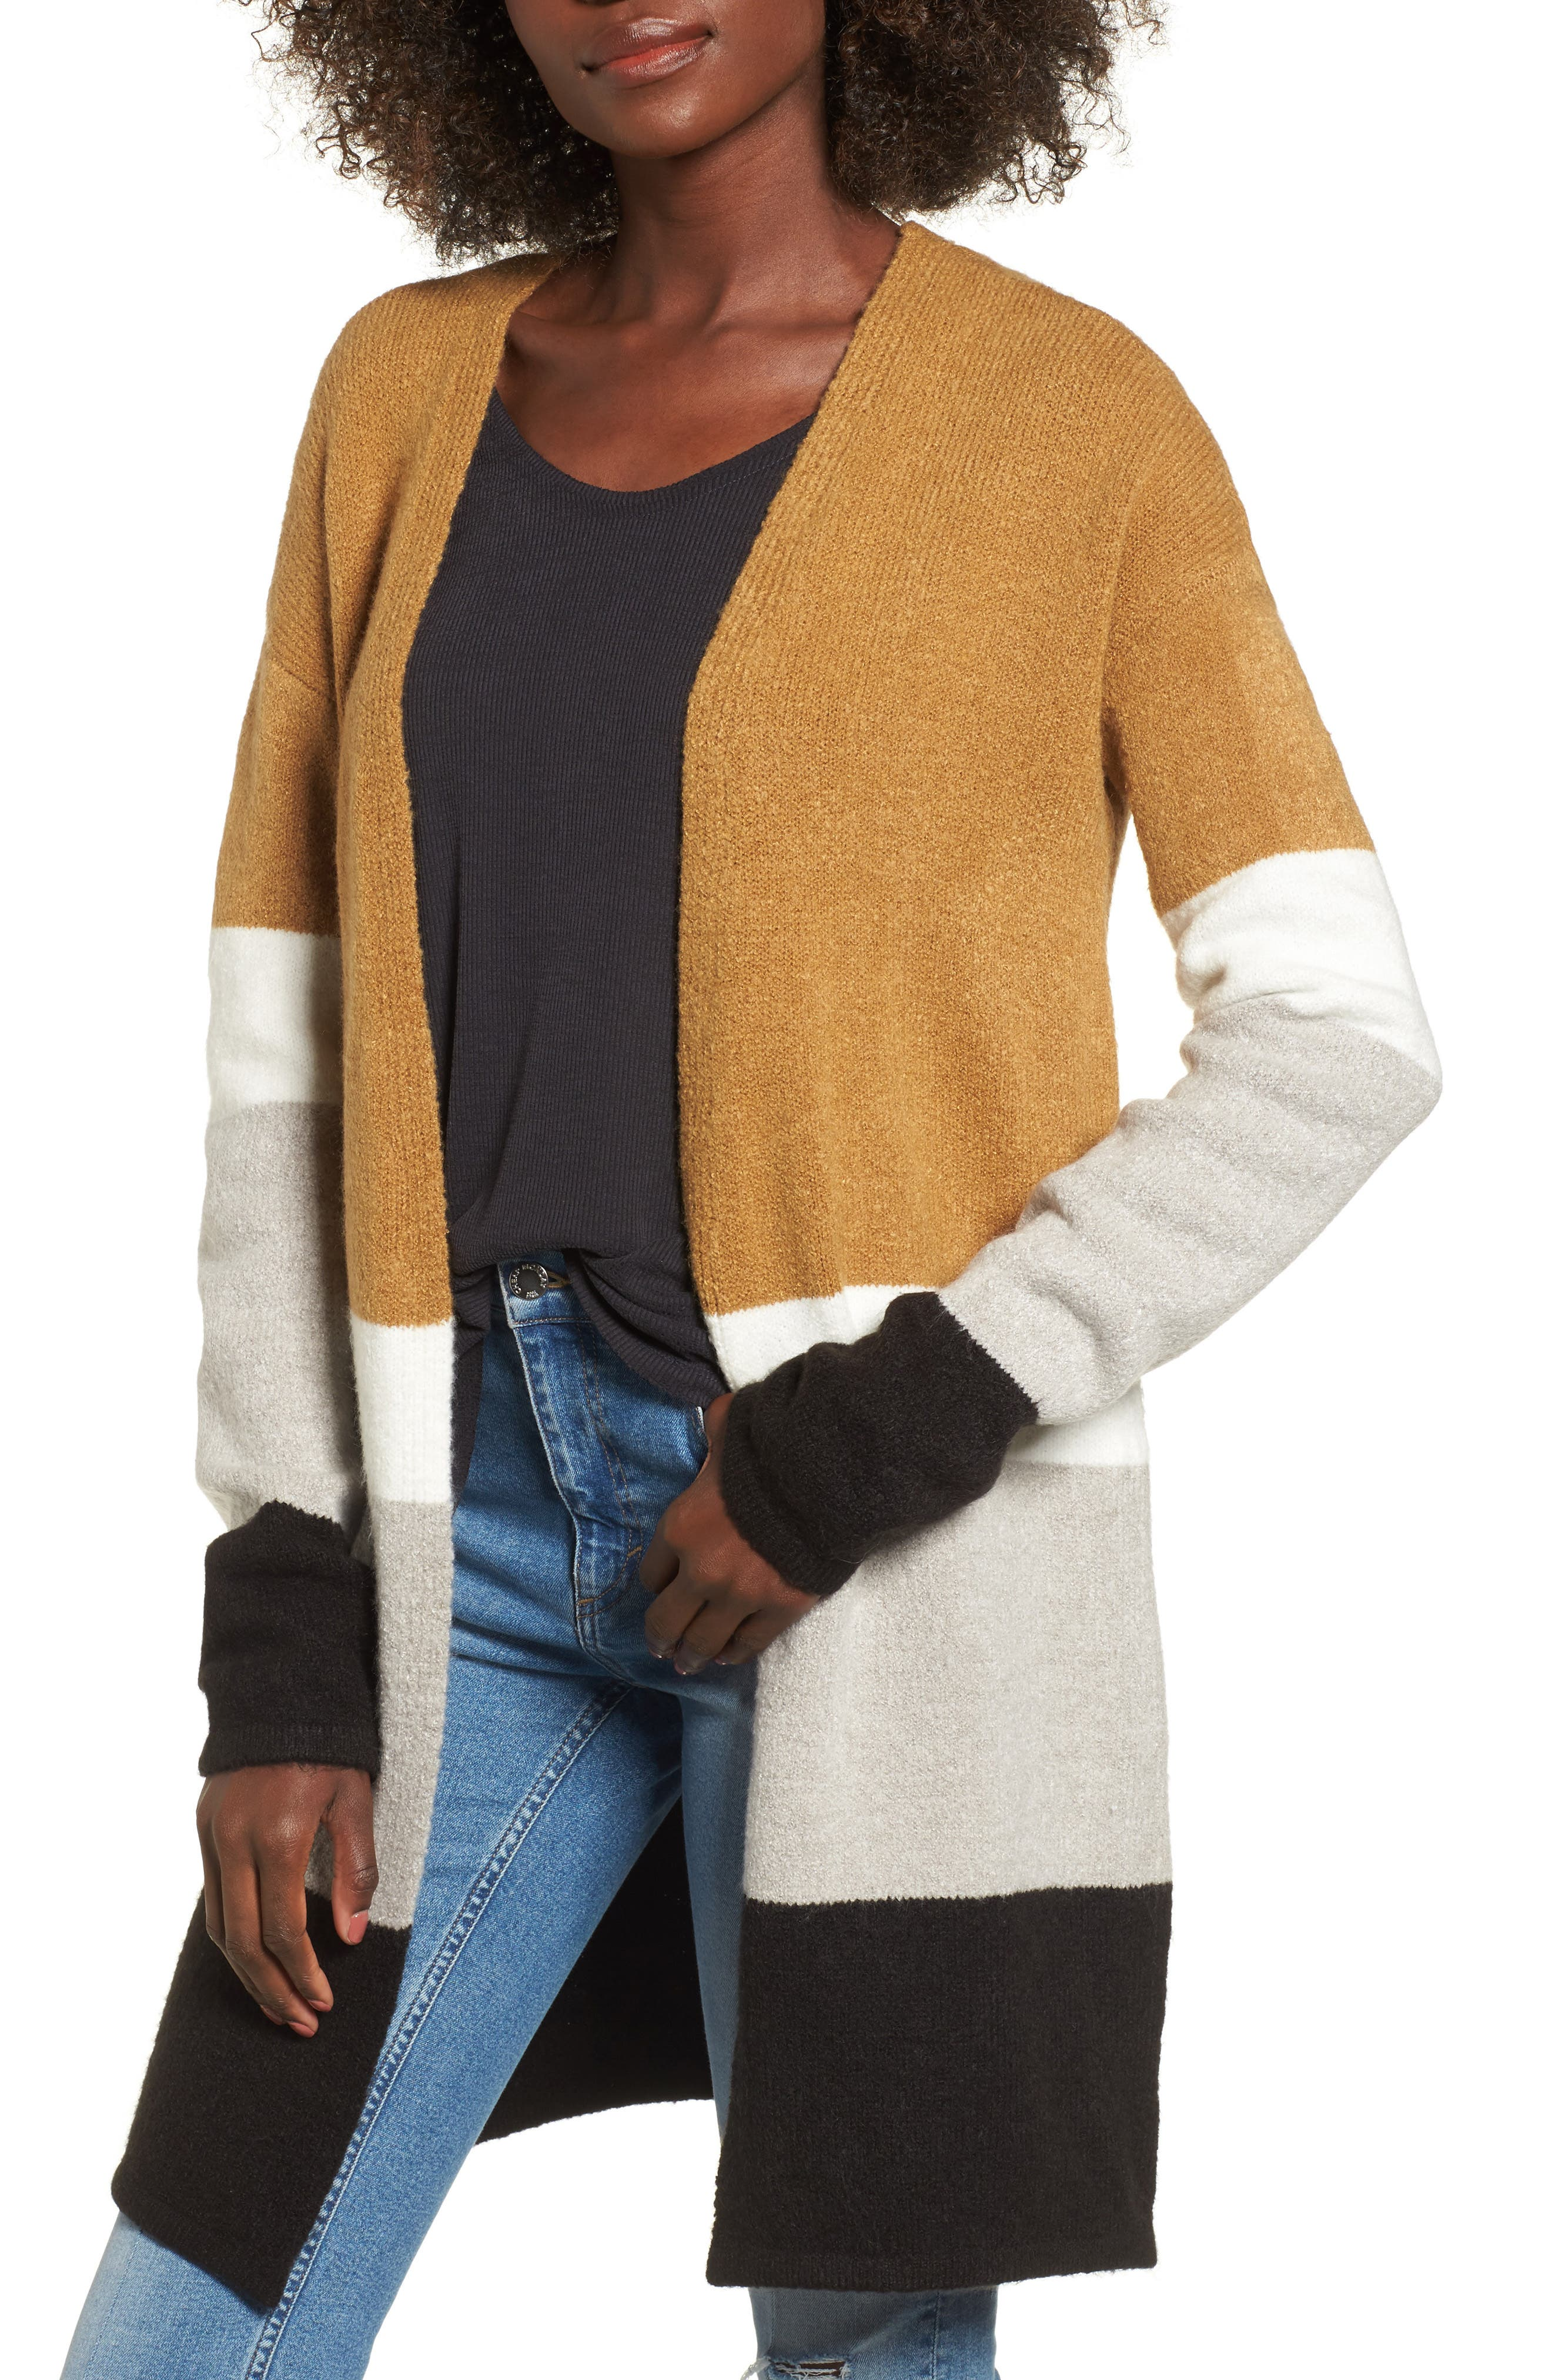 Mens Christmas Sweater Vest